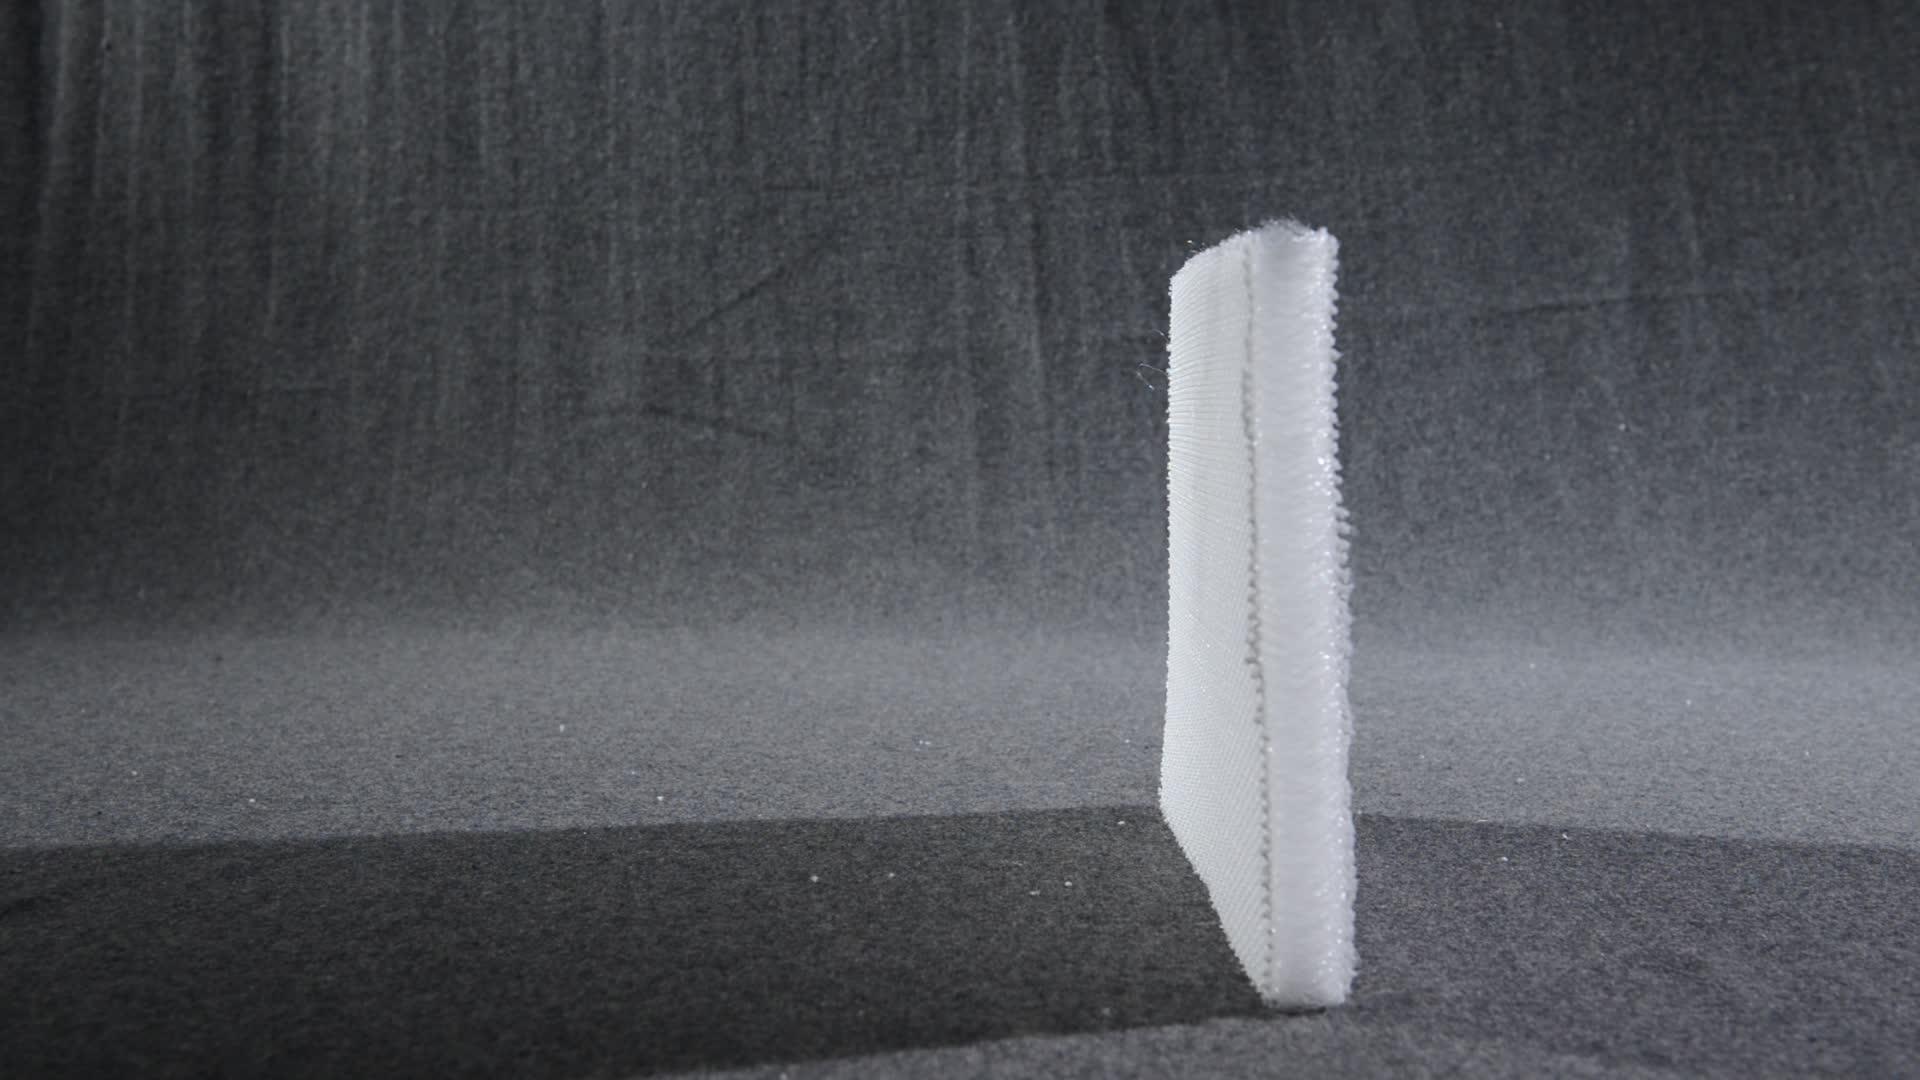 SGS Certtification 経編 3D 空気メッシュクッションマットカバーベビーヘッド整形枕カバー